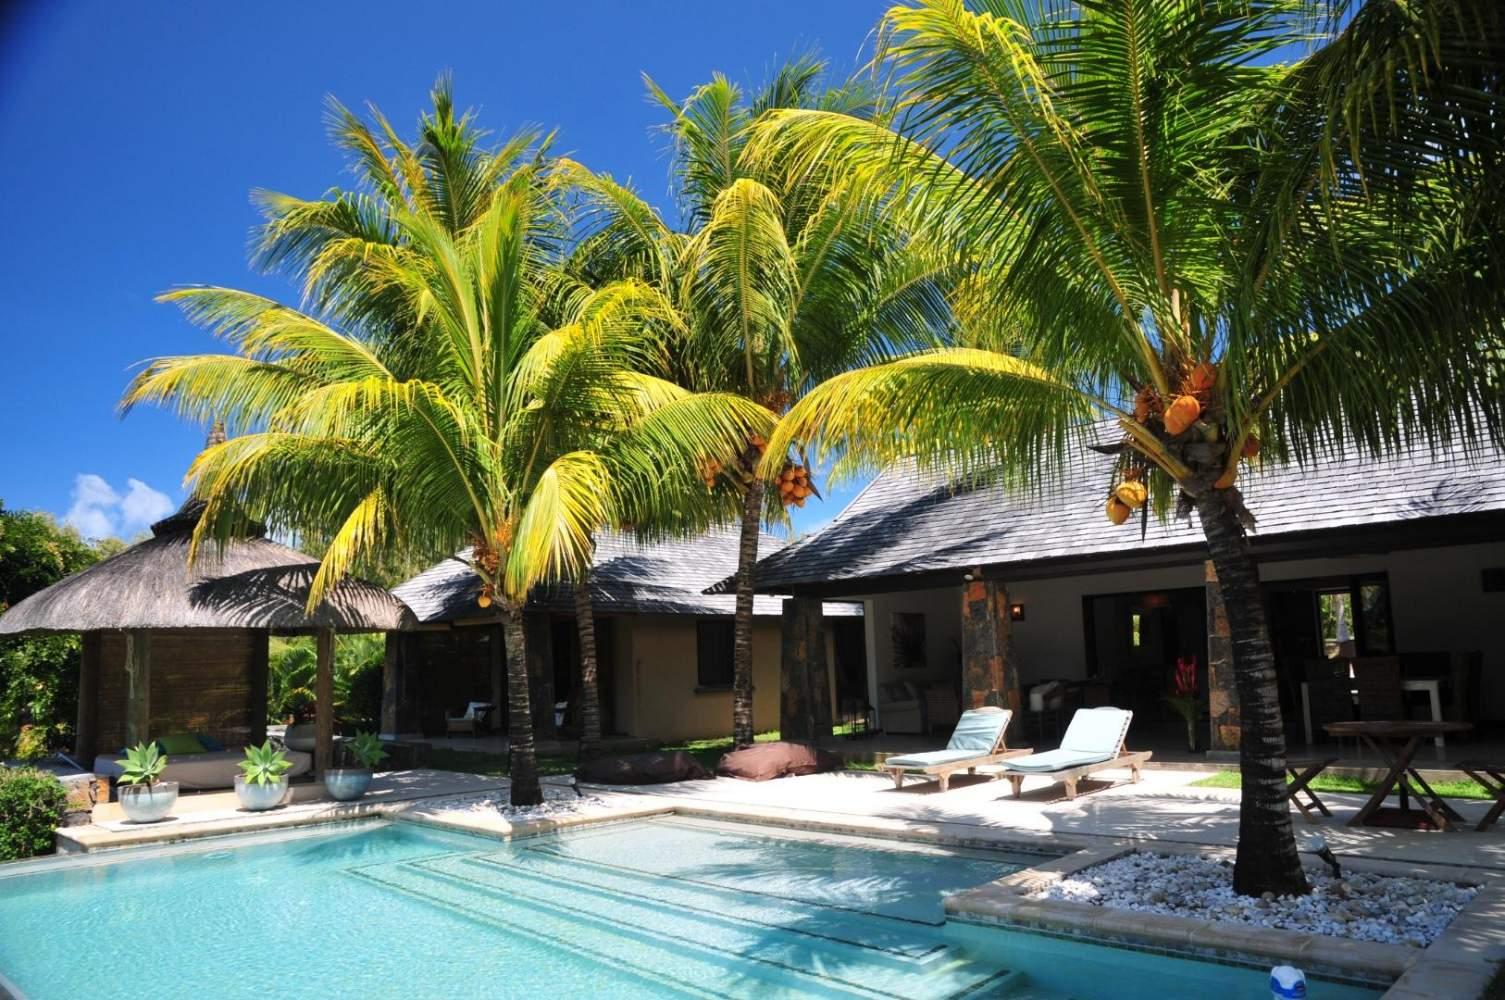 Location villa hammamet avec piscine priv e et vue mer en for Recherche villa avec piscine